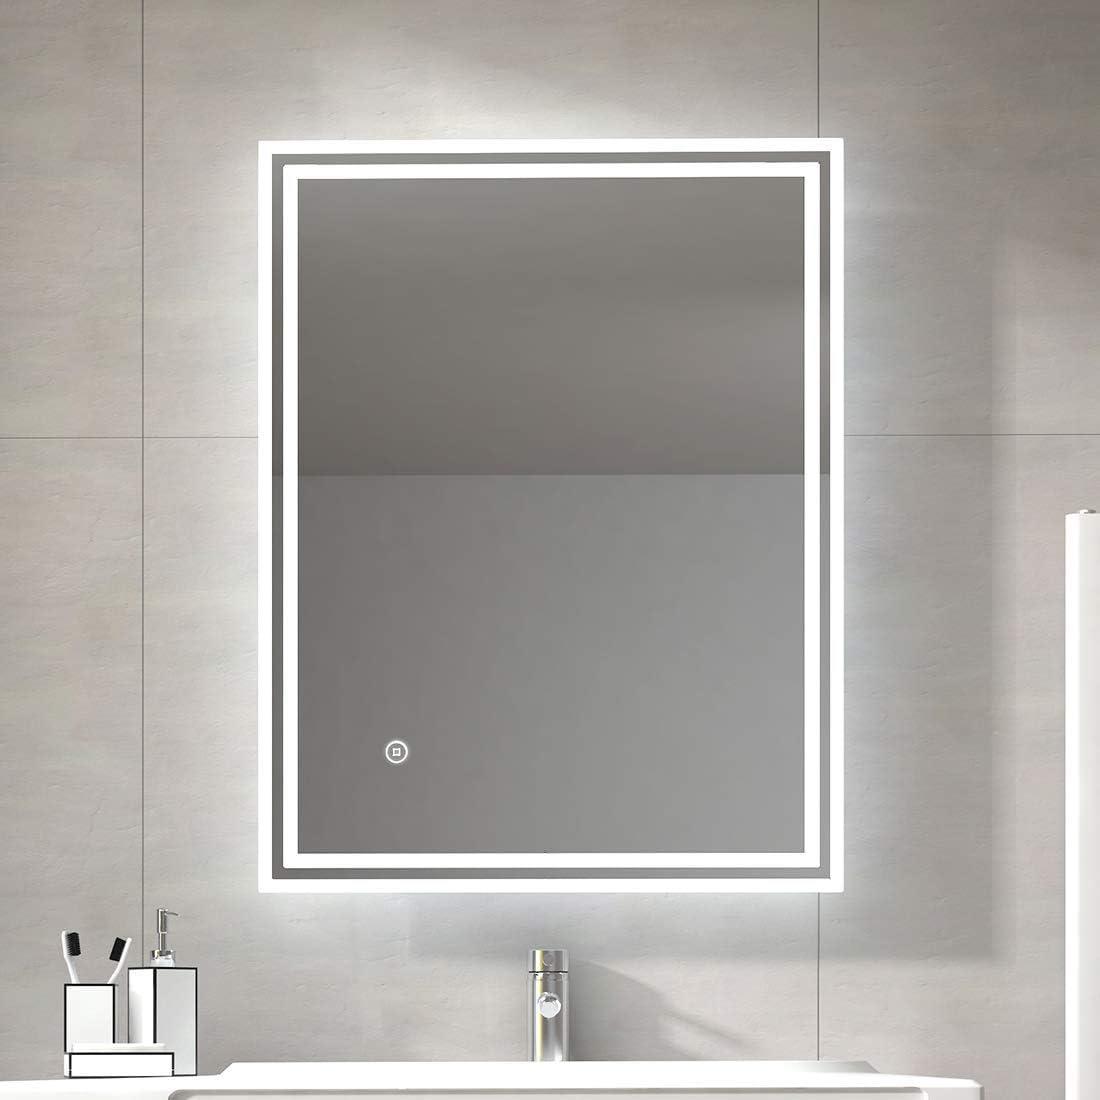 Demister 80x60cm Illuminated LED Bathroom Mirror LED Mirrors Light with Sensor